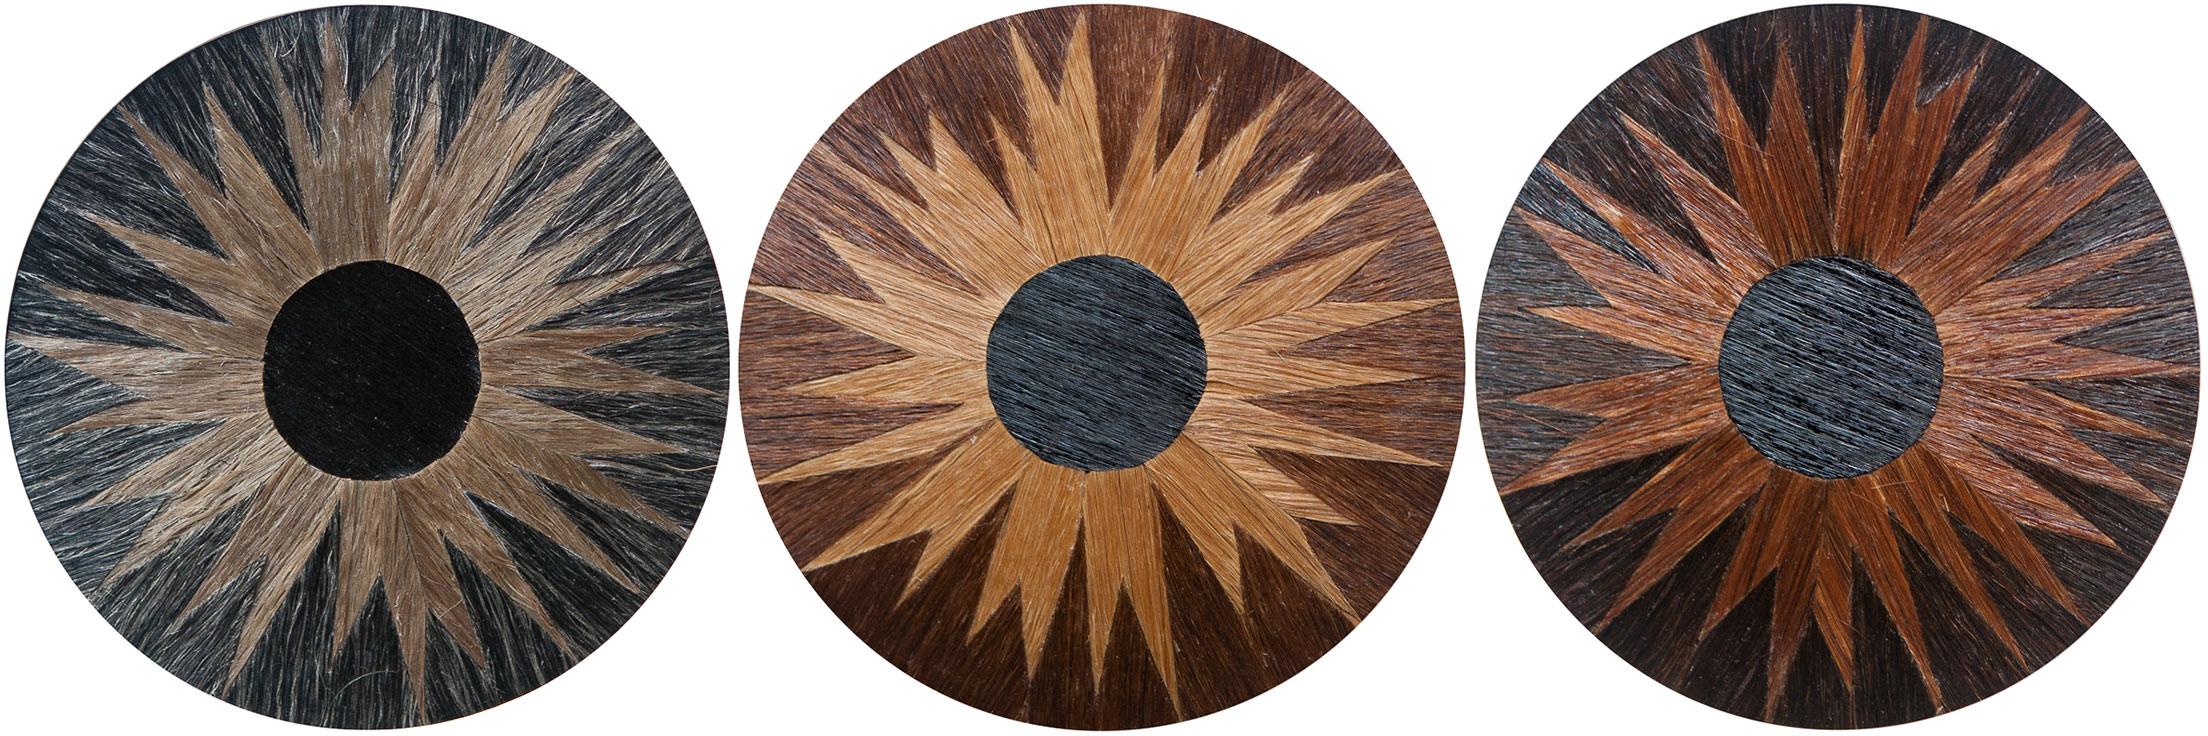 """Blue Eye"" ""Brown Eye"" and ""Dark Brown Eye"" each 4""x4"", human hair and acrylic on paper, 2014."